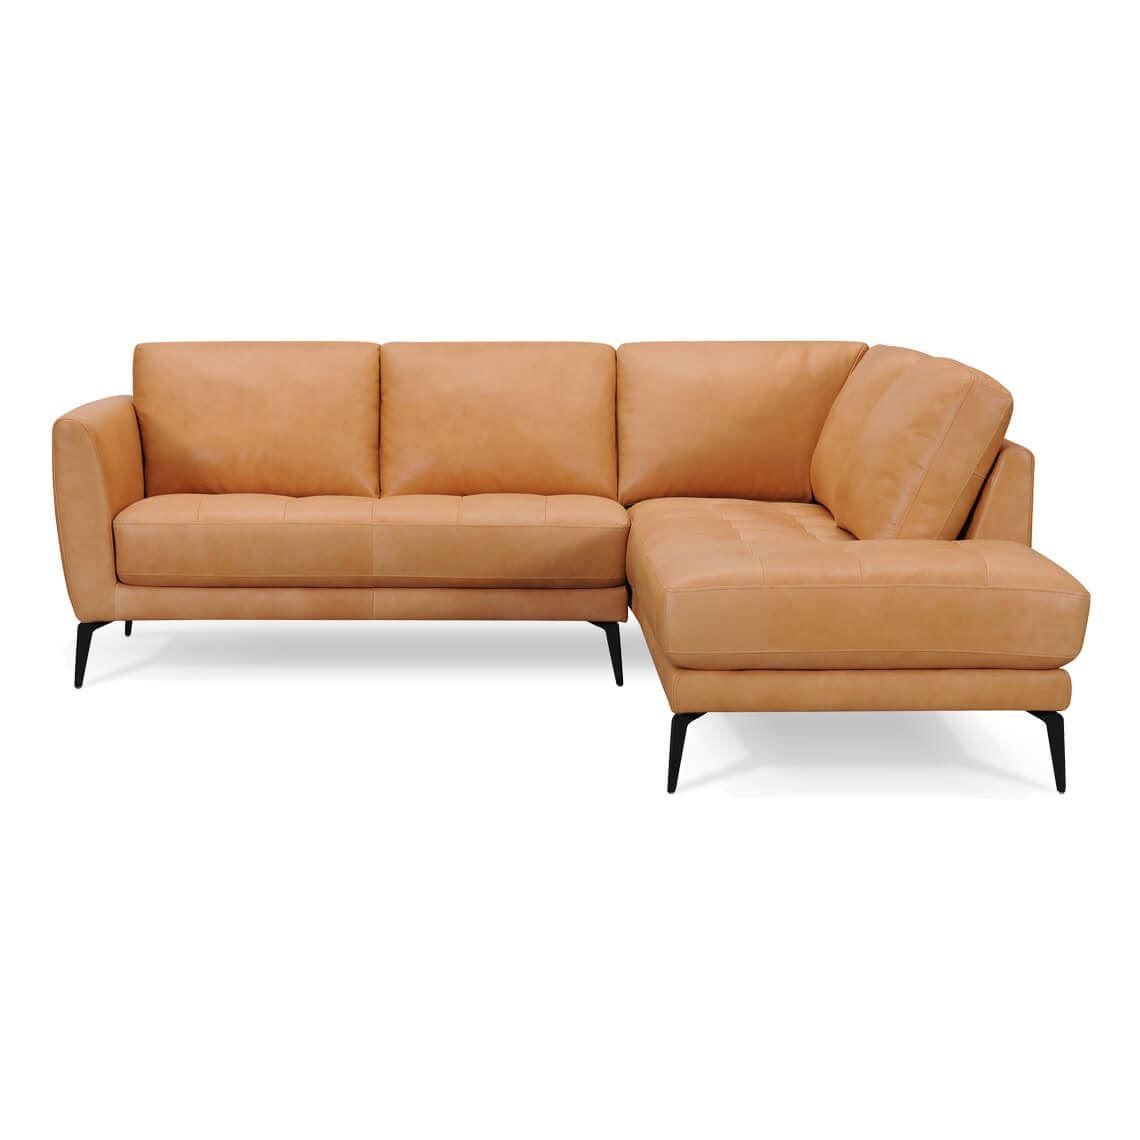 Attica 2 Seat Leather Modular Sofa With Right Terminal